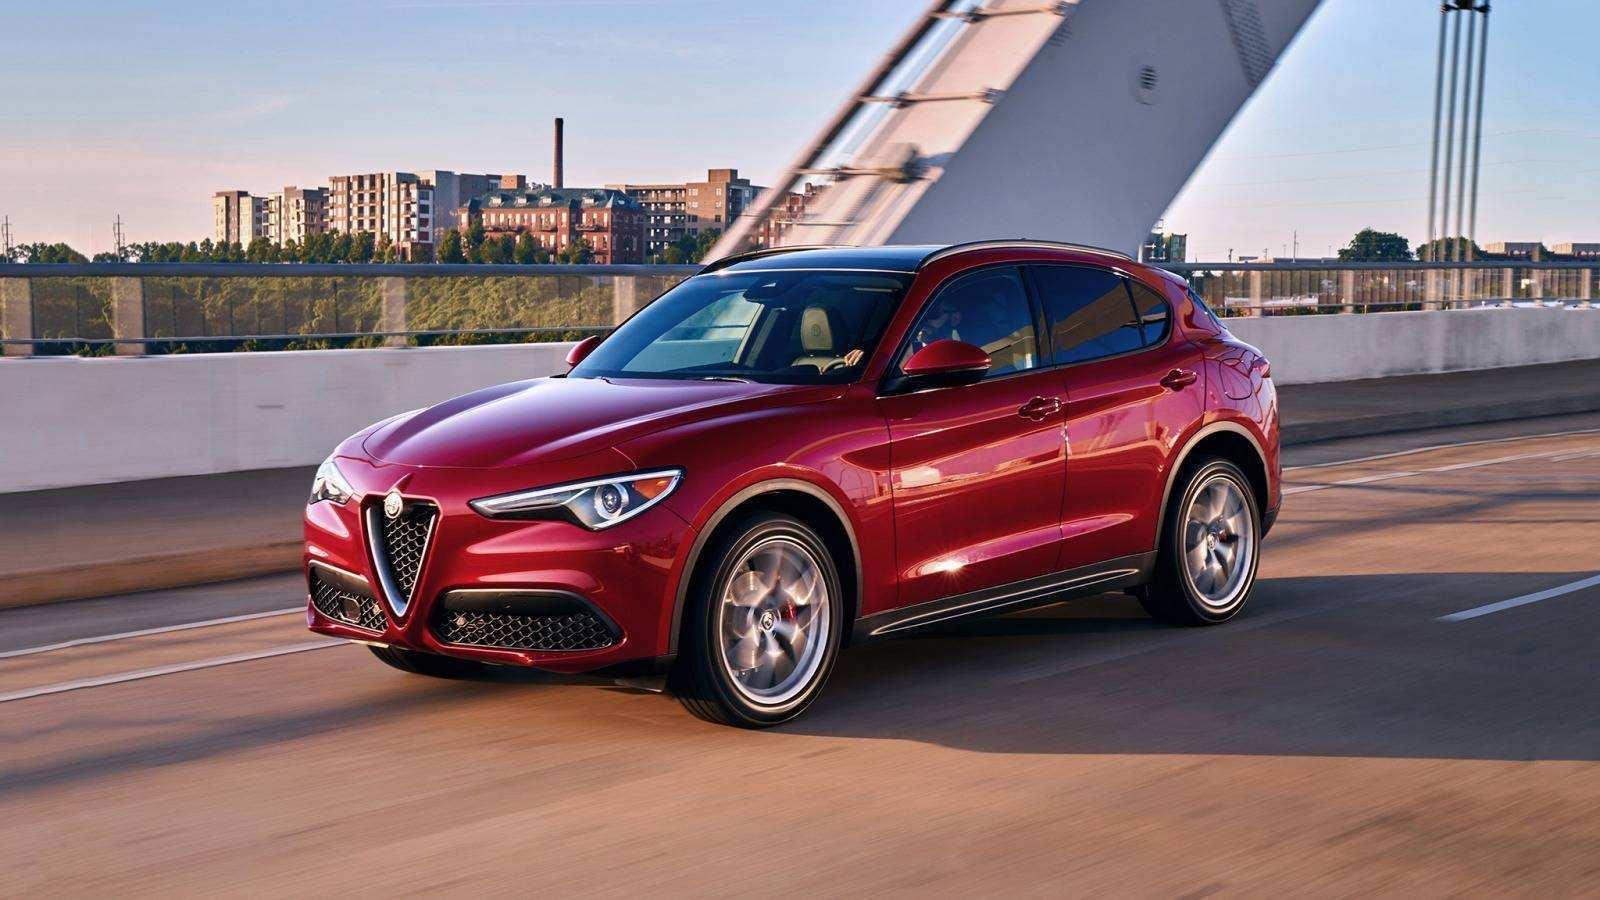 61 All New 2019 Alfa Romeo Stelvio Release Date Redesign with 2019 Alfa Romeo Stelvio Release Date